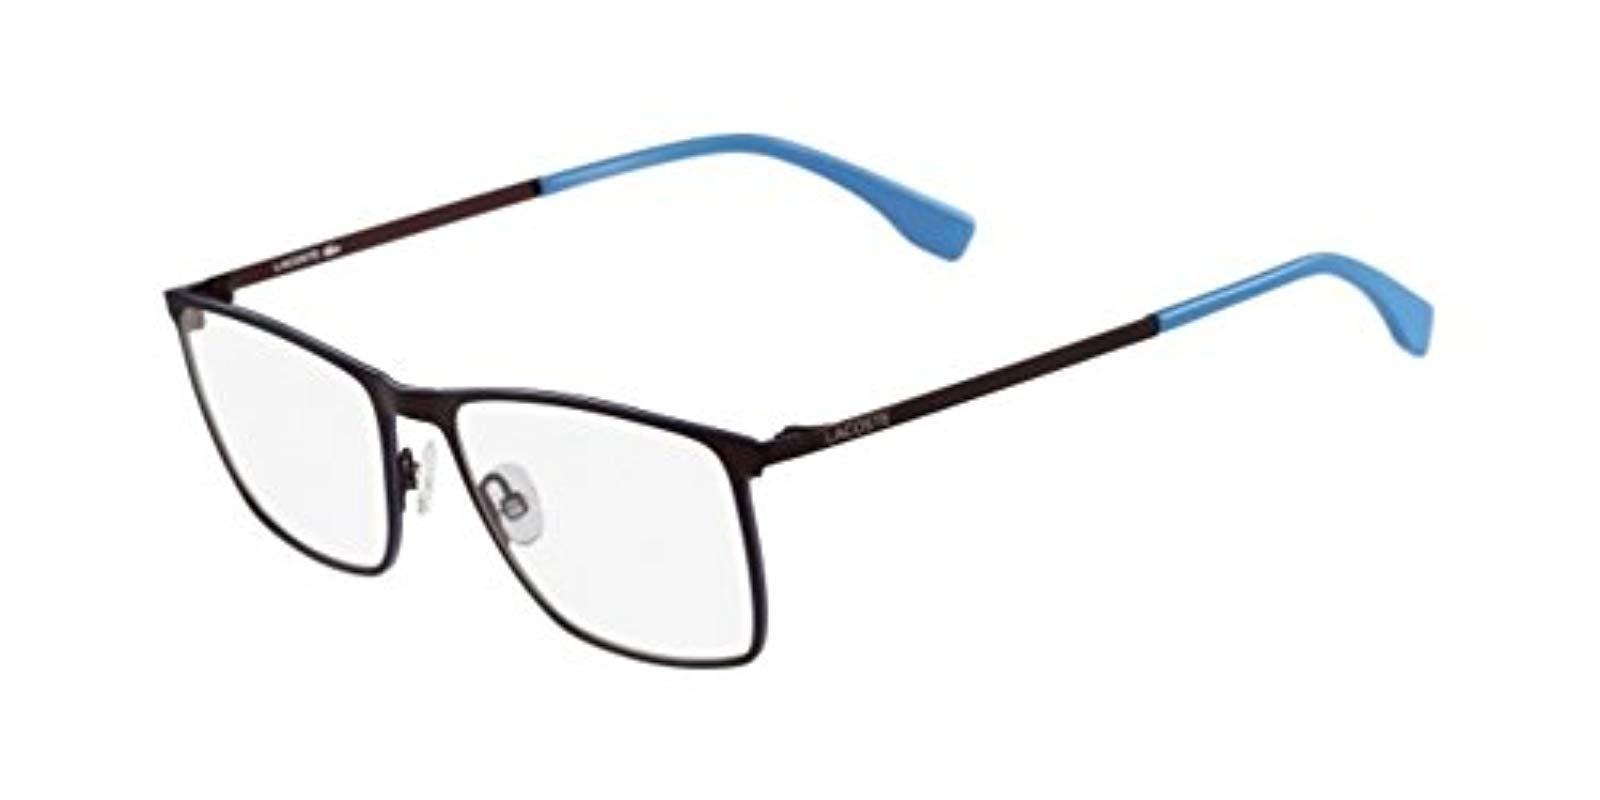 Lacoste L2223 615 54 Optical Frames, Matte Red in Blue for Men - Lyst cb21616d4264